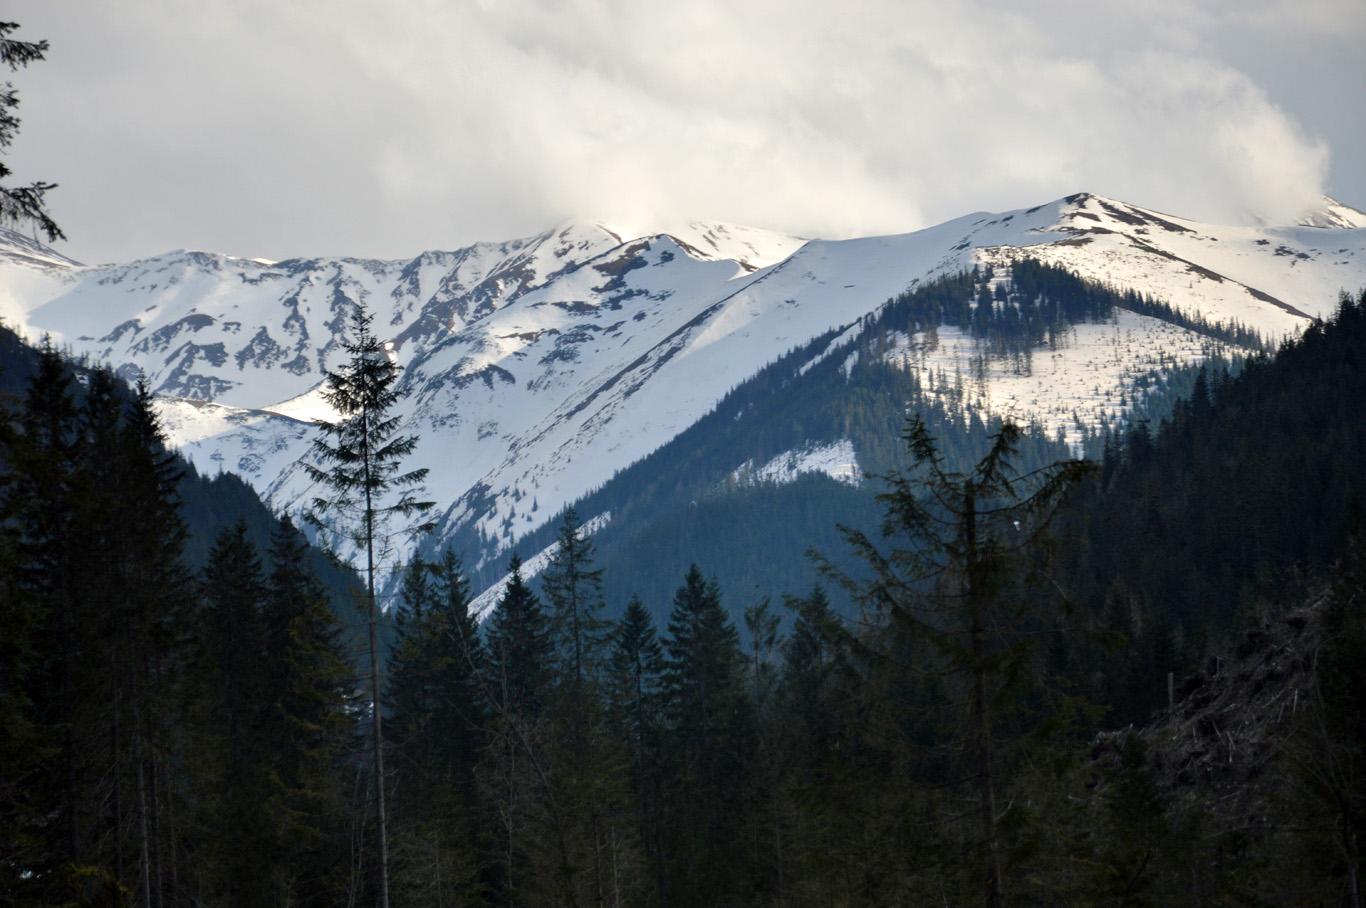 Snowy peaks around